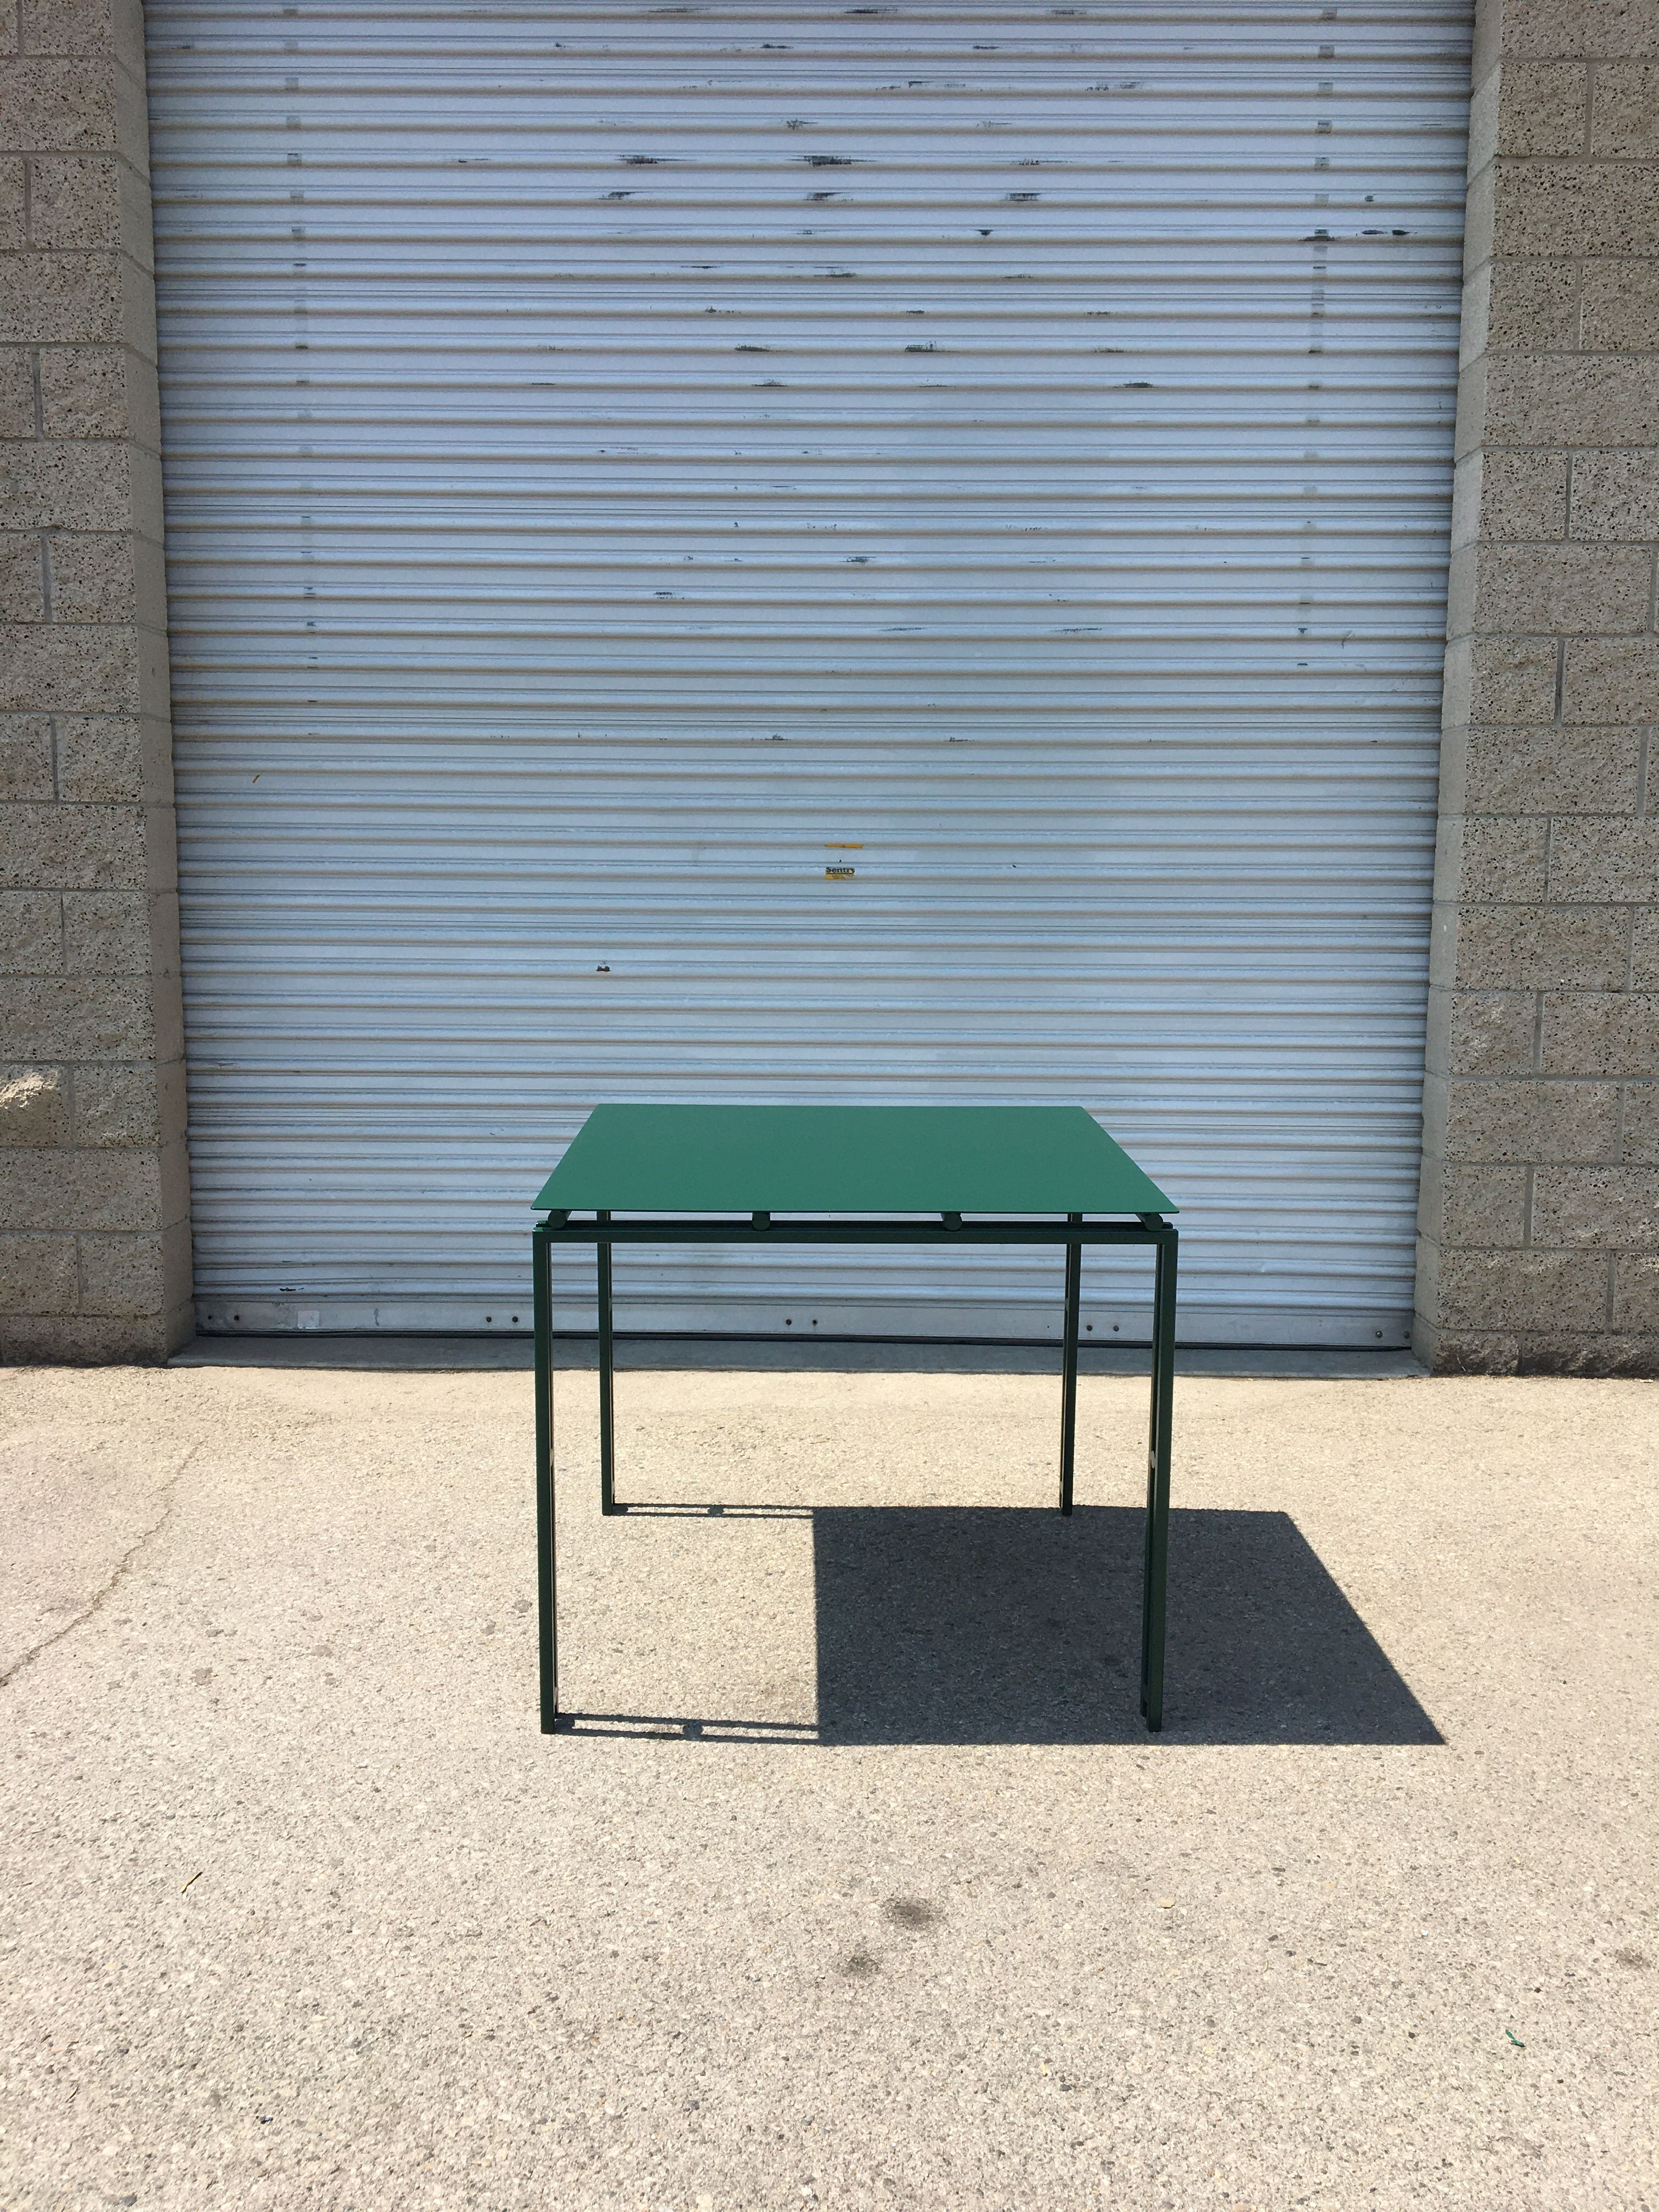 Suspension Metal Set - Breakfast Size product image 10